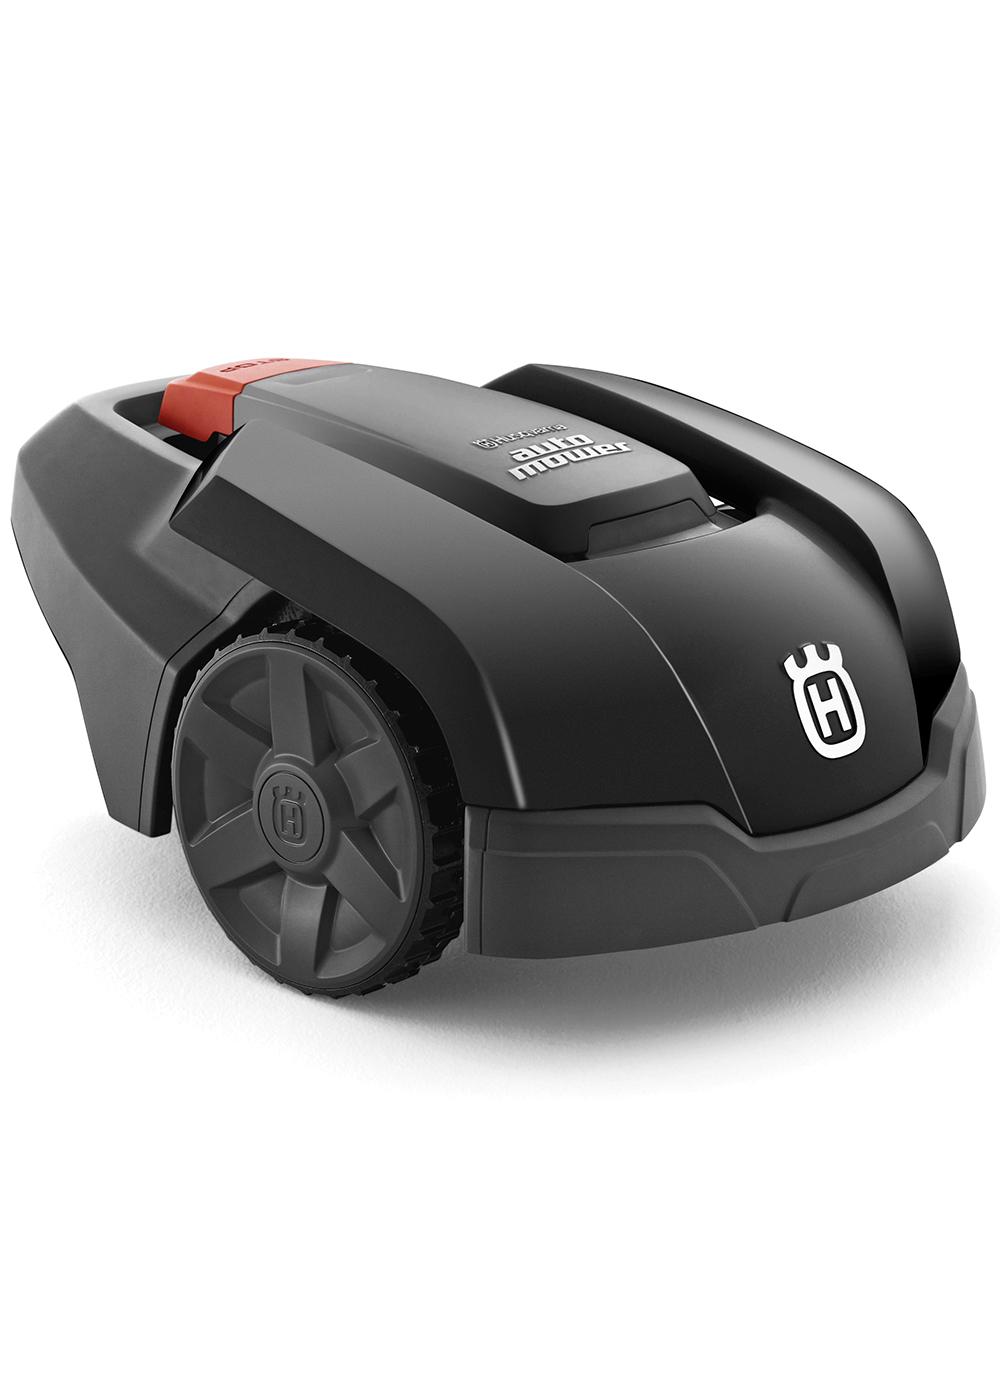 robot tondeuse husqvarna 105